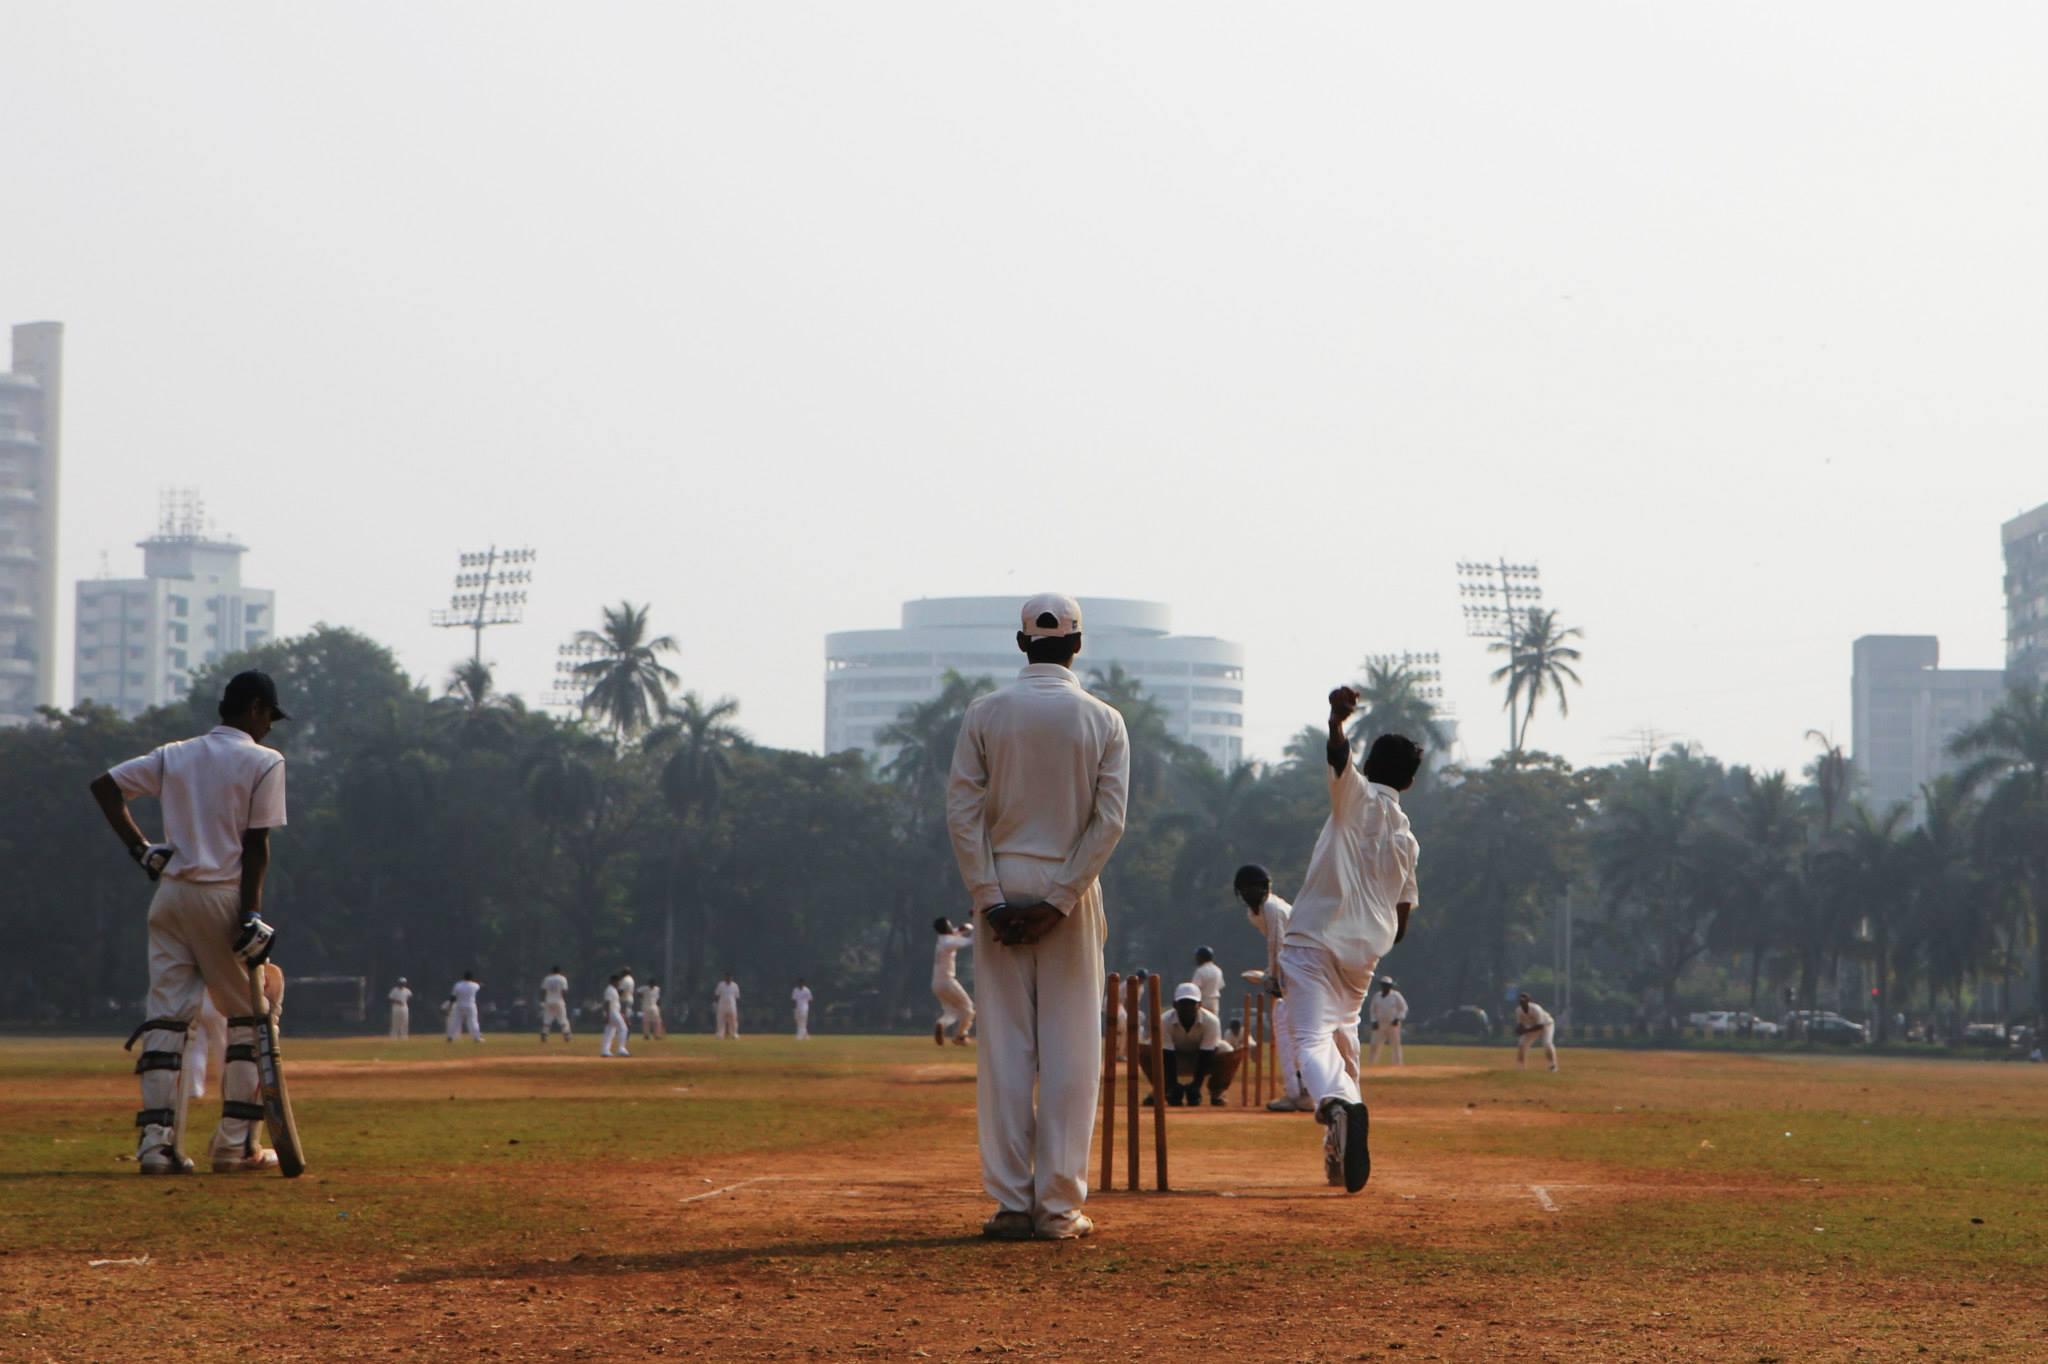 Cricketspelers in het centrale park van Mumbai